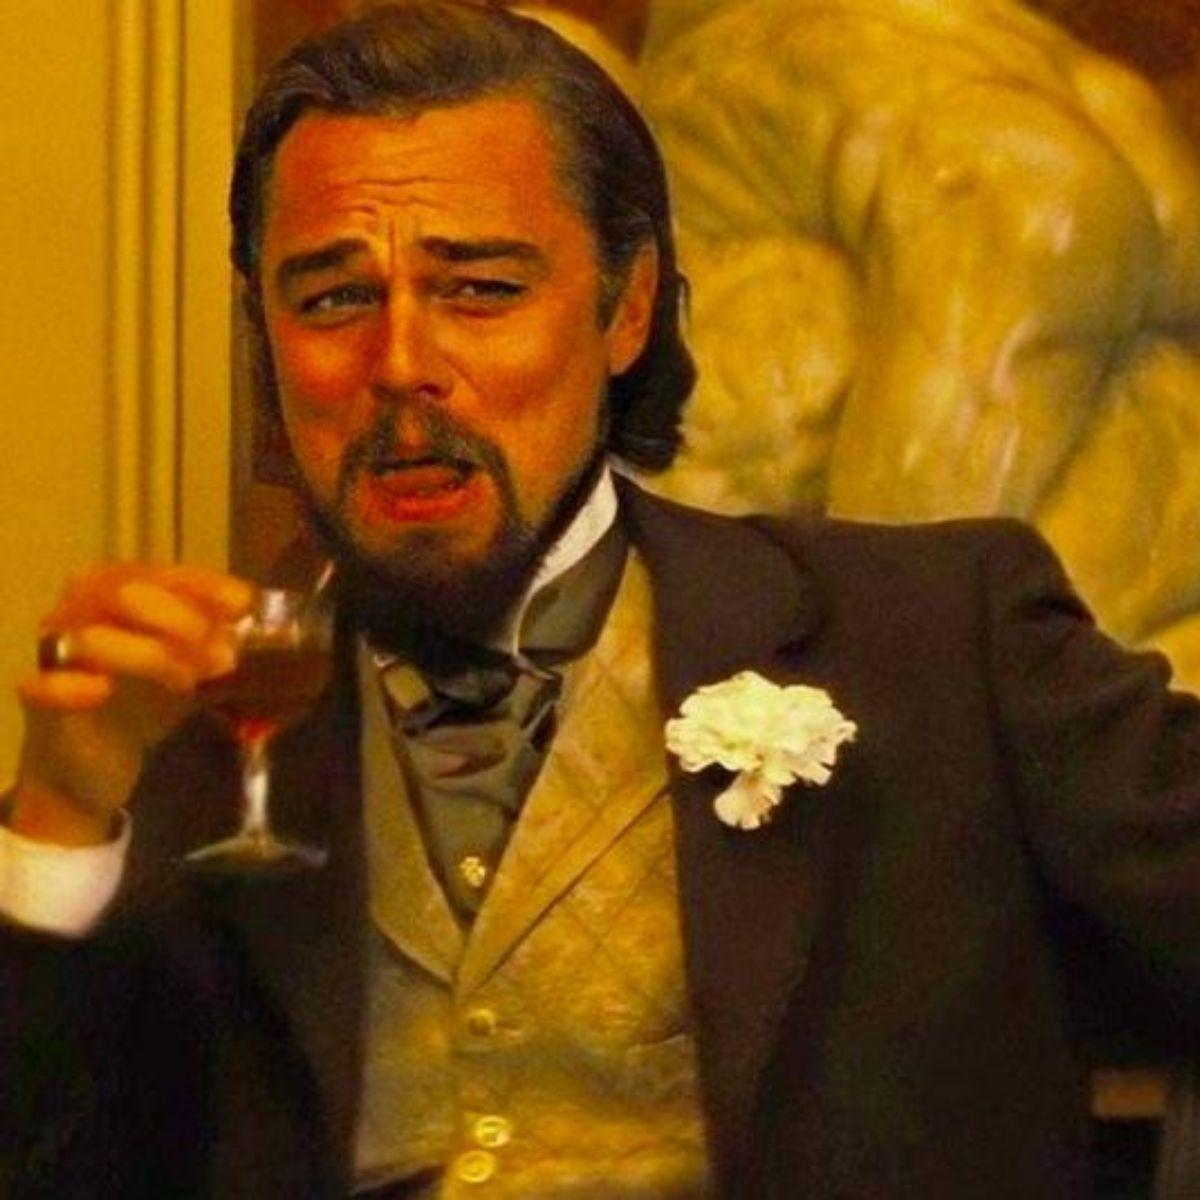 Leonardo_DiCaprio_laughing_meme_template_of_Django_Unchained.jpg